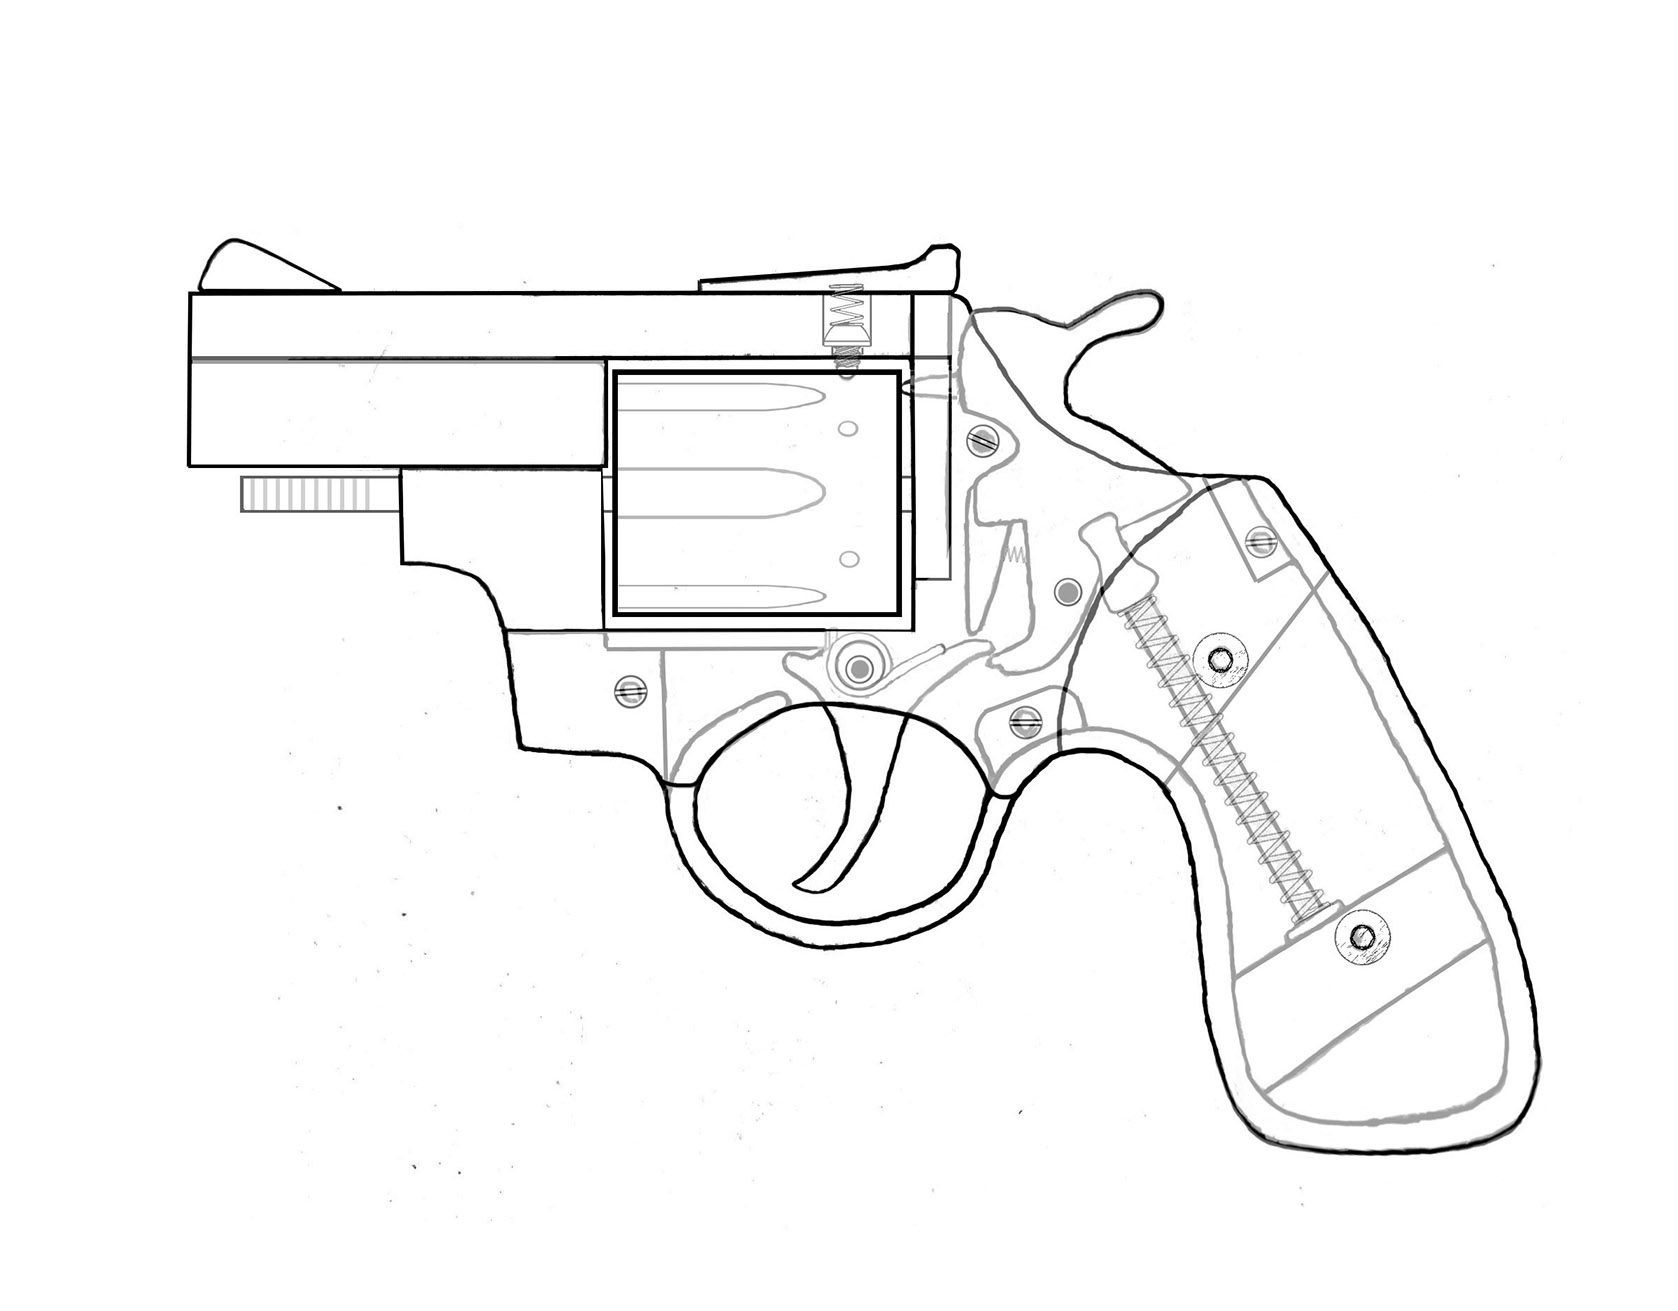 1678x1311 Impro Guns The International Commission On Global Improvised